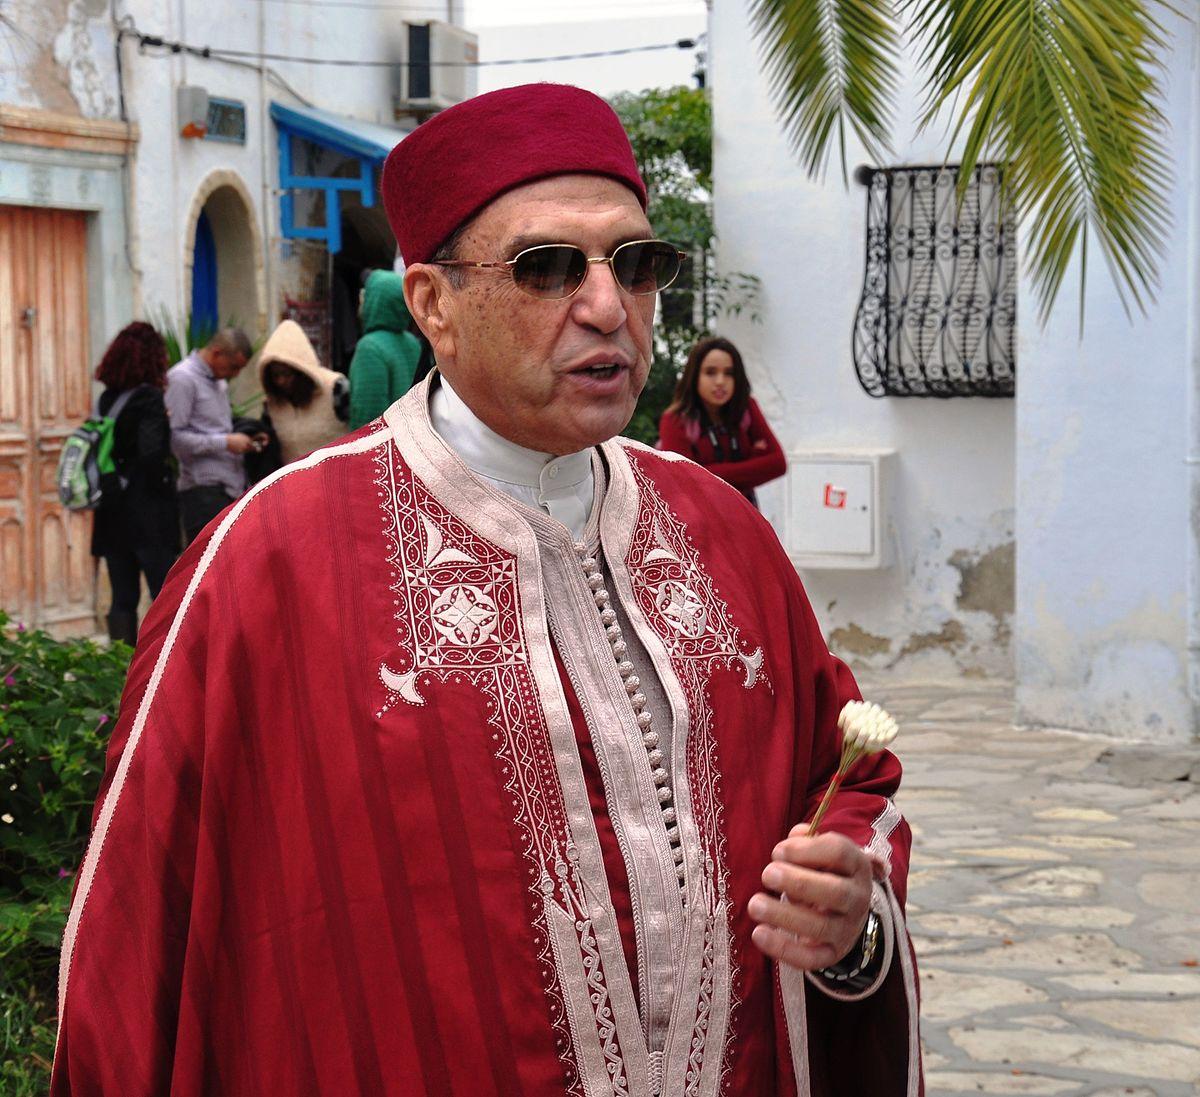 Femme tunisienne cherche homme tunisien pour mariage